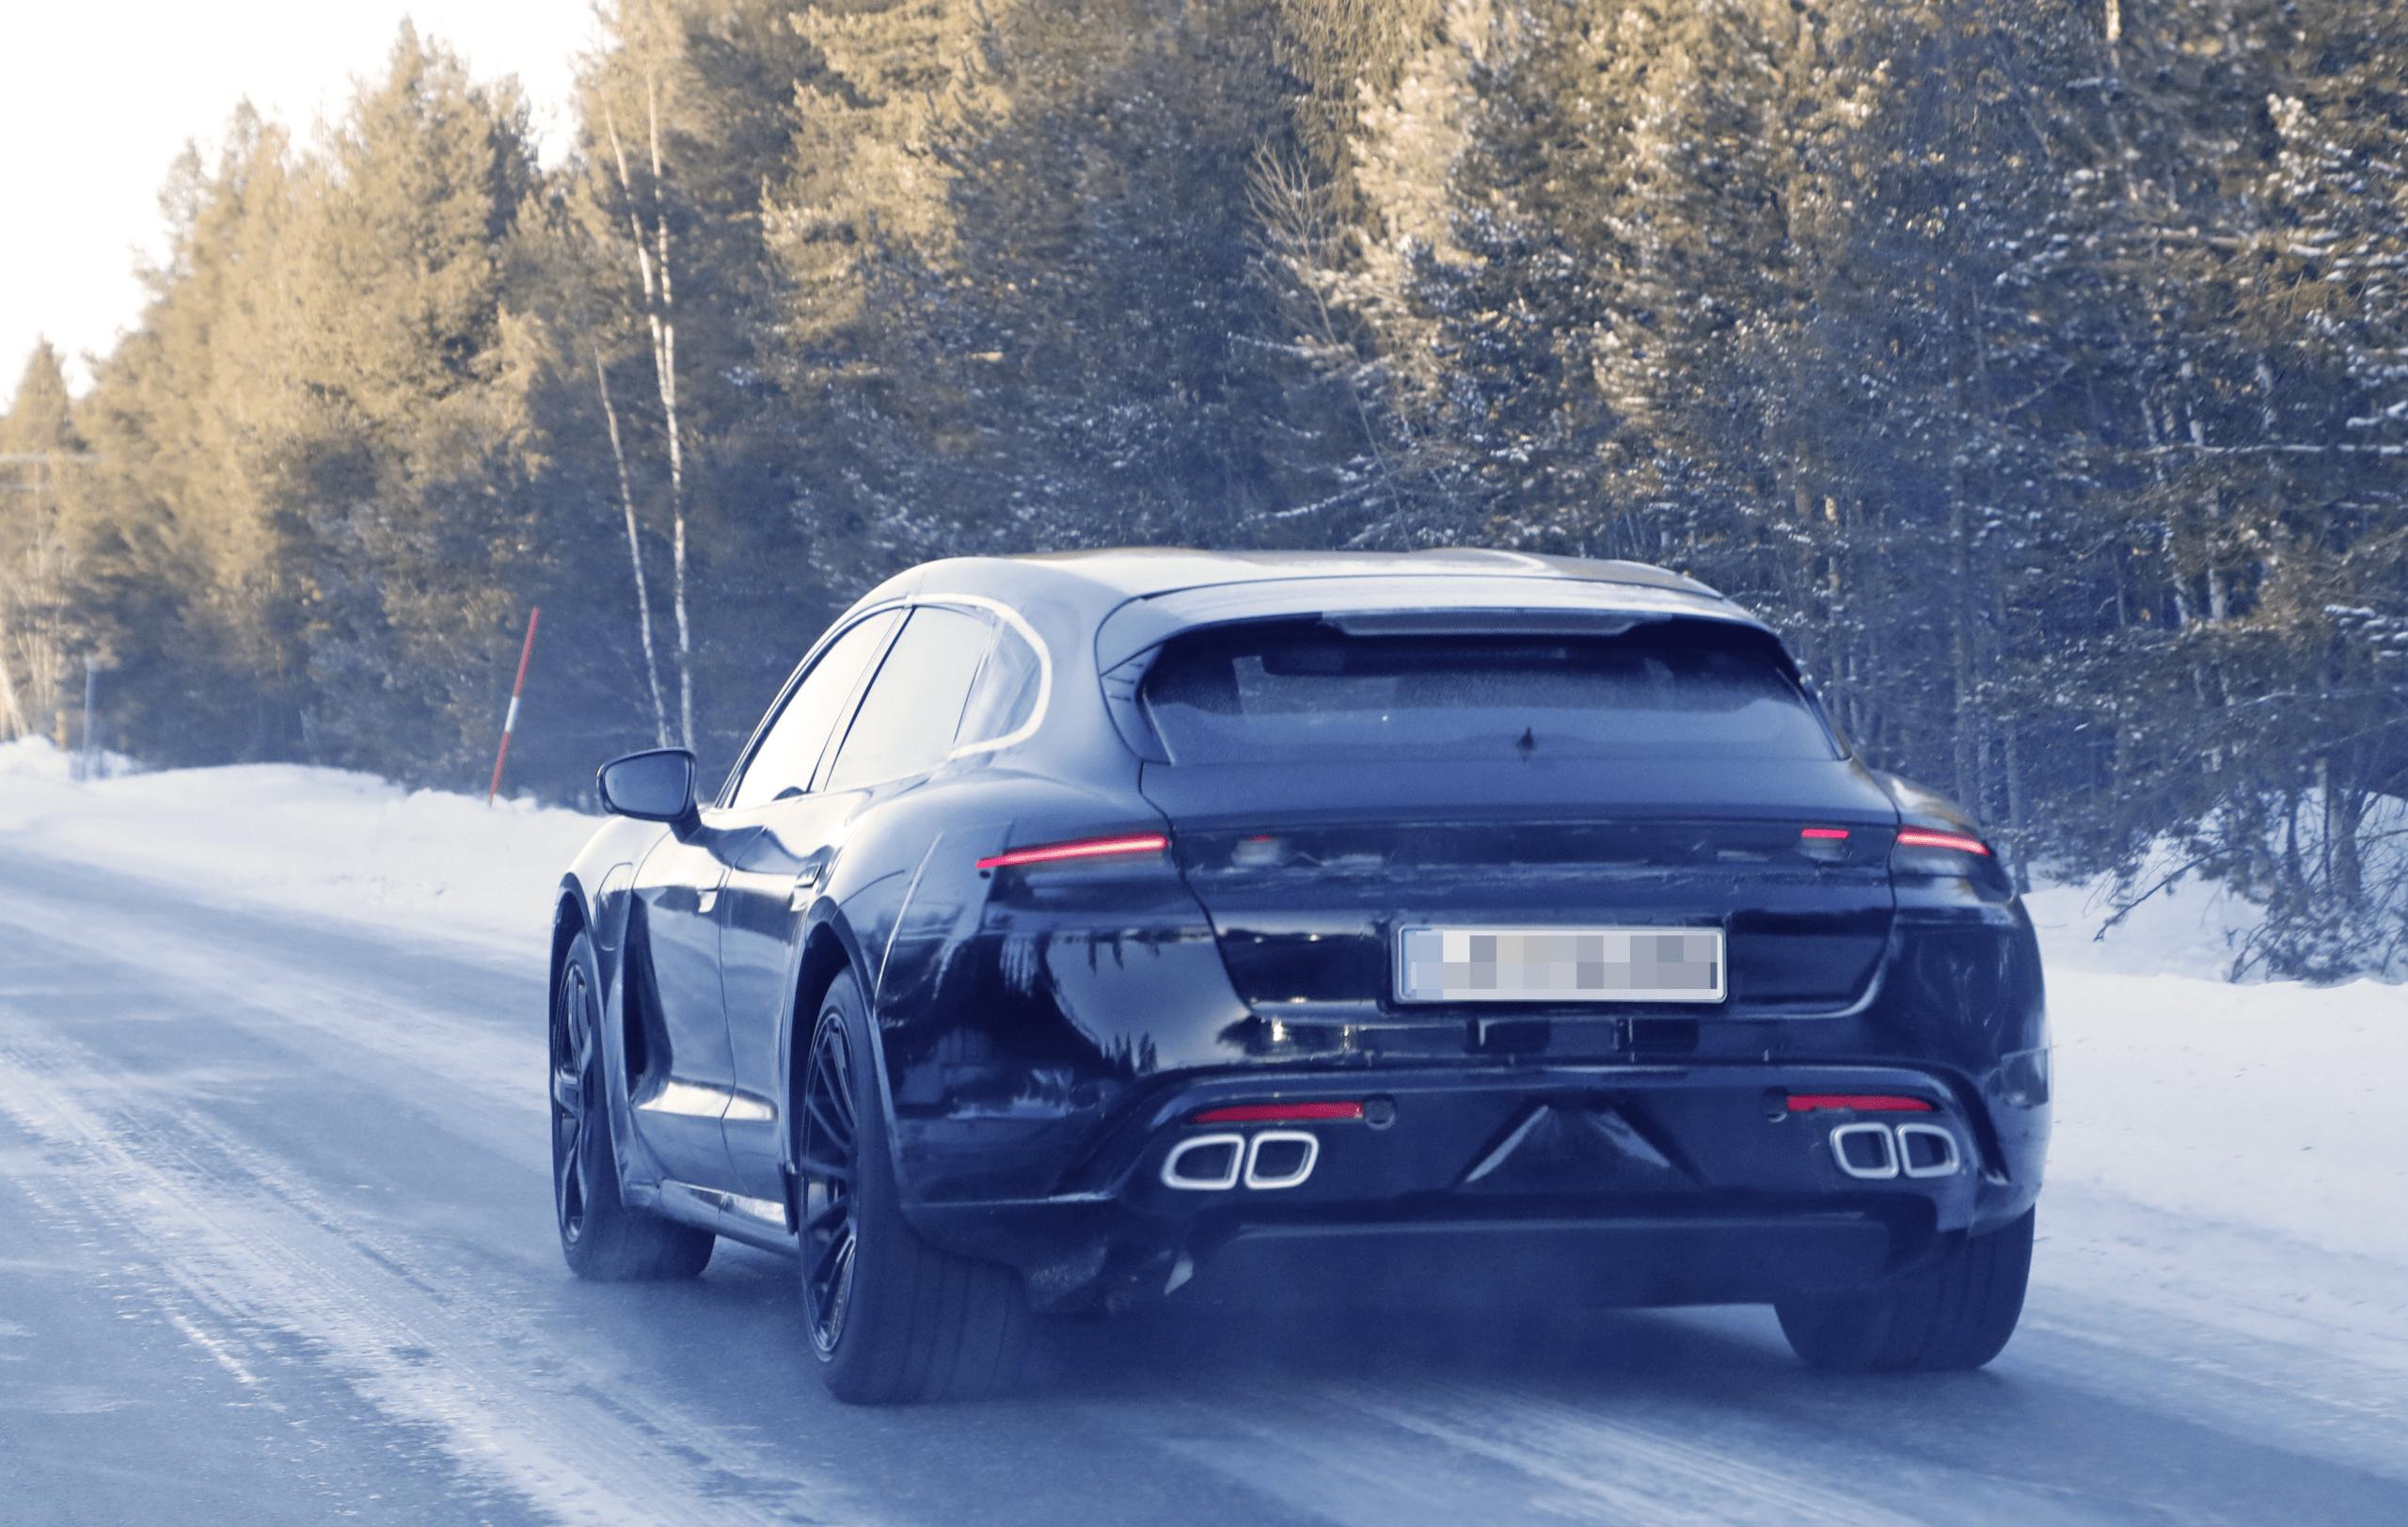 2020 Jaguar Suv Price Design And Review In 2020 Jaguar Suv Porsche Cayenne Porsche